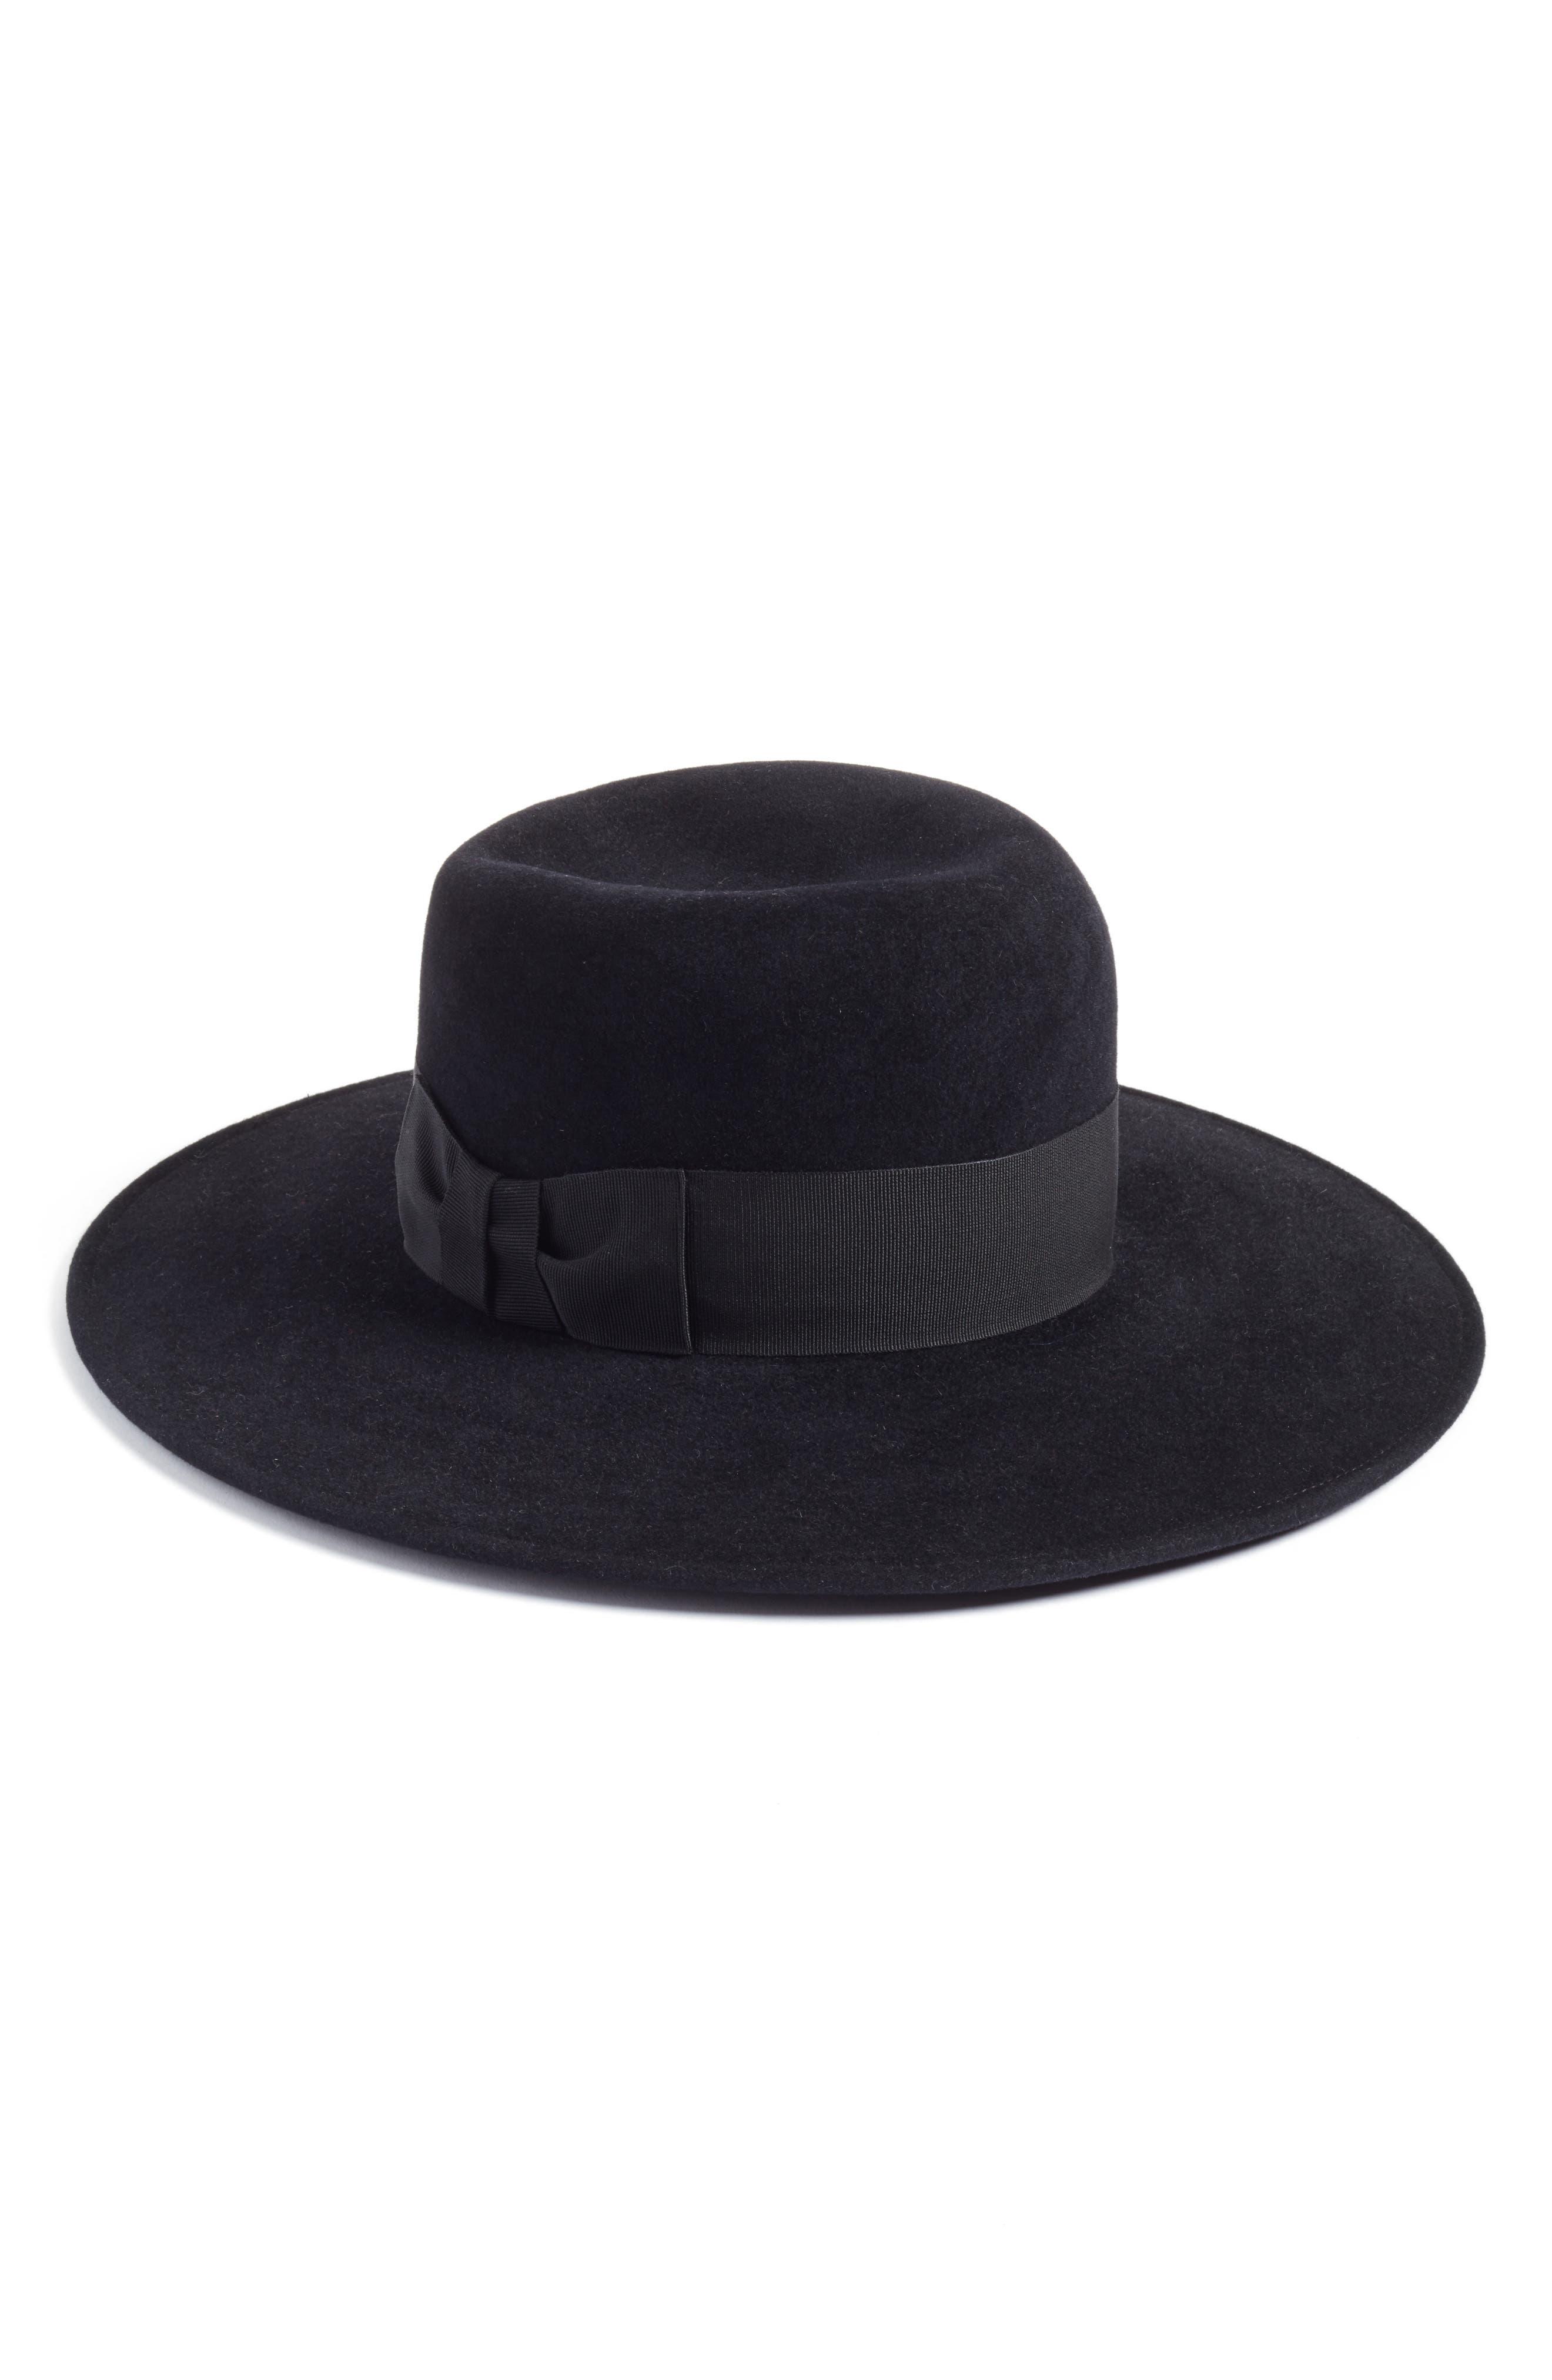 Eric Javits Velour Padre Fur Felt Wide Brim Hat